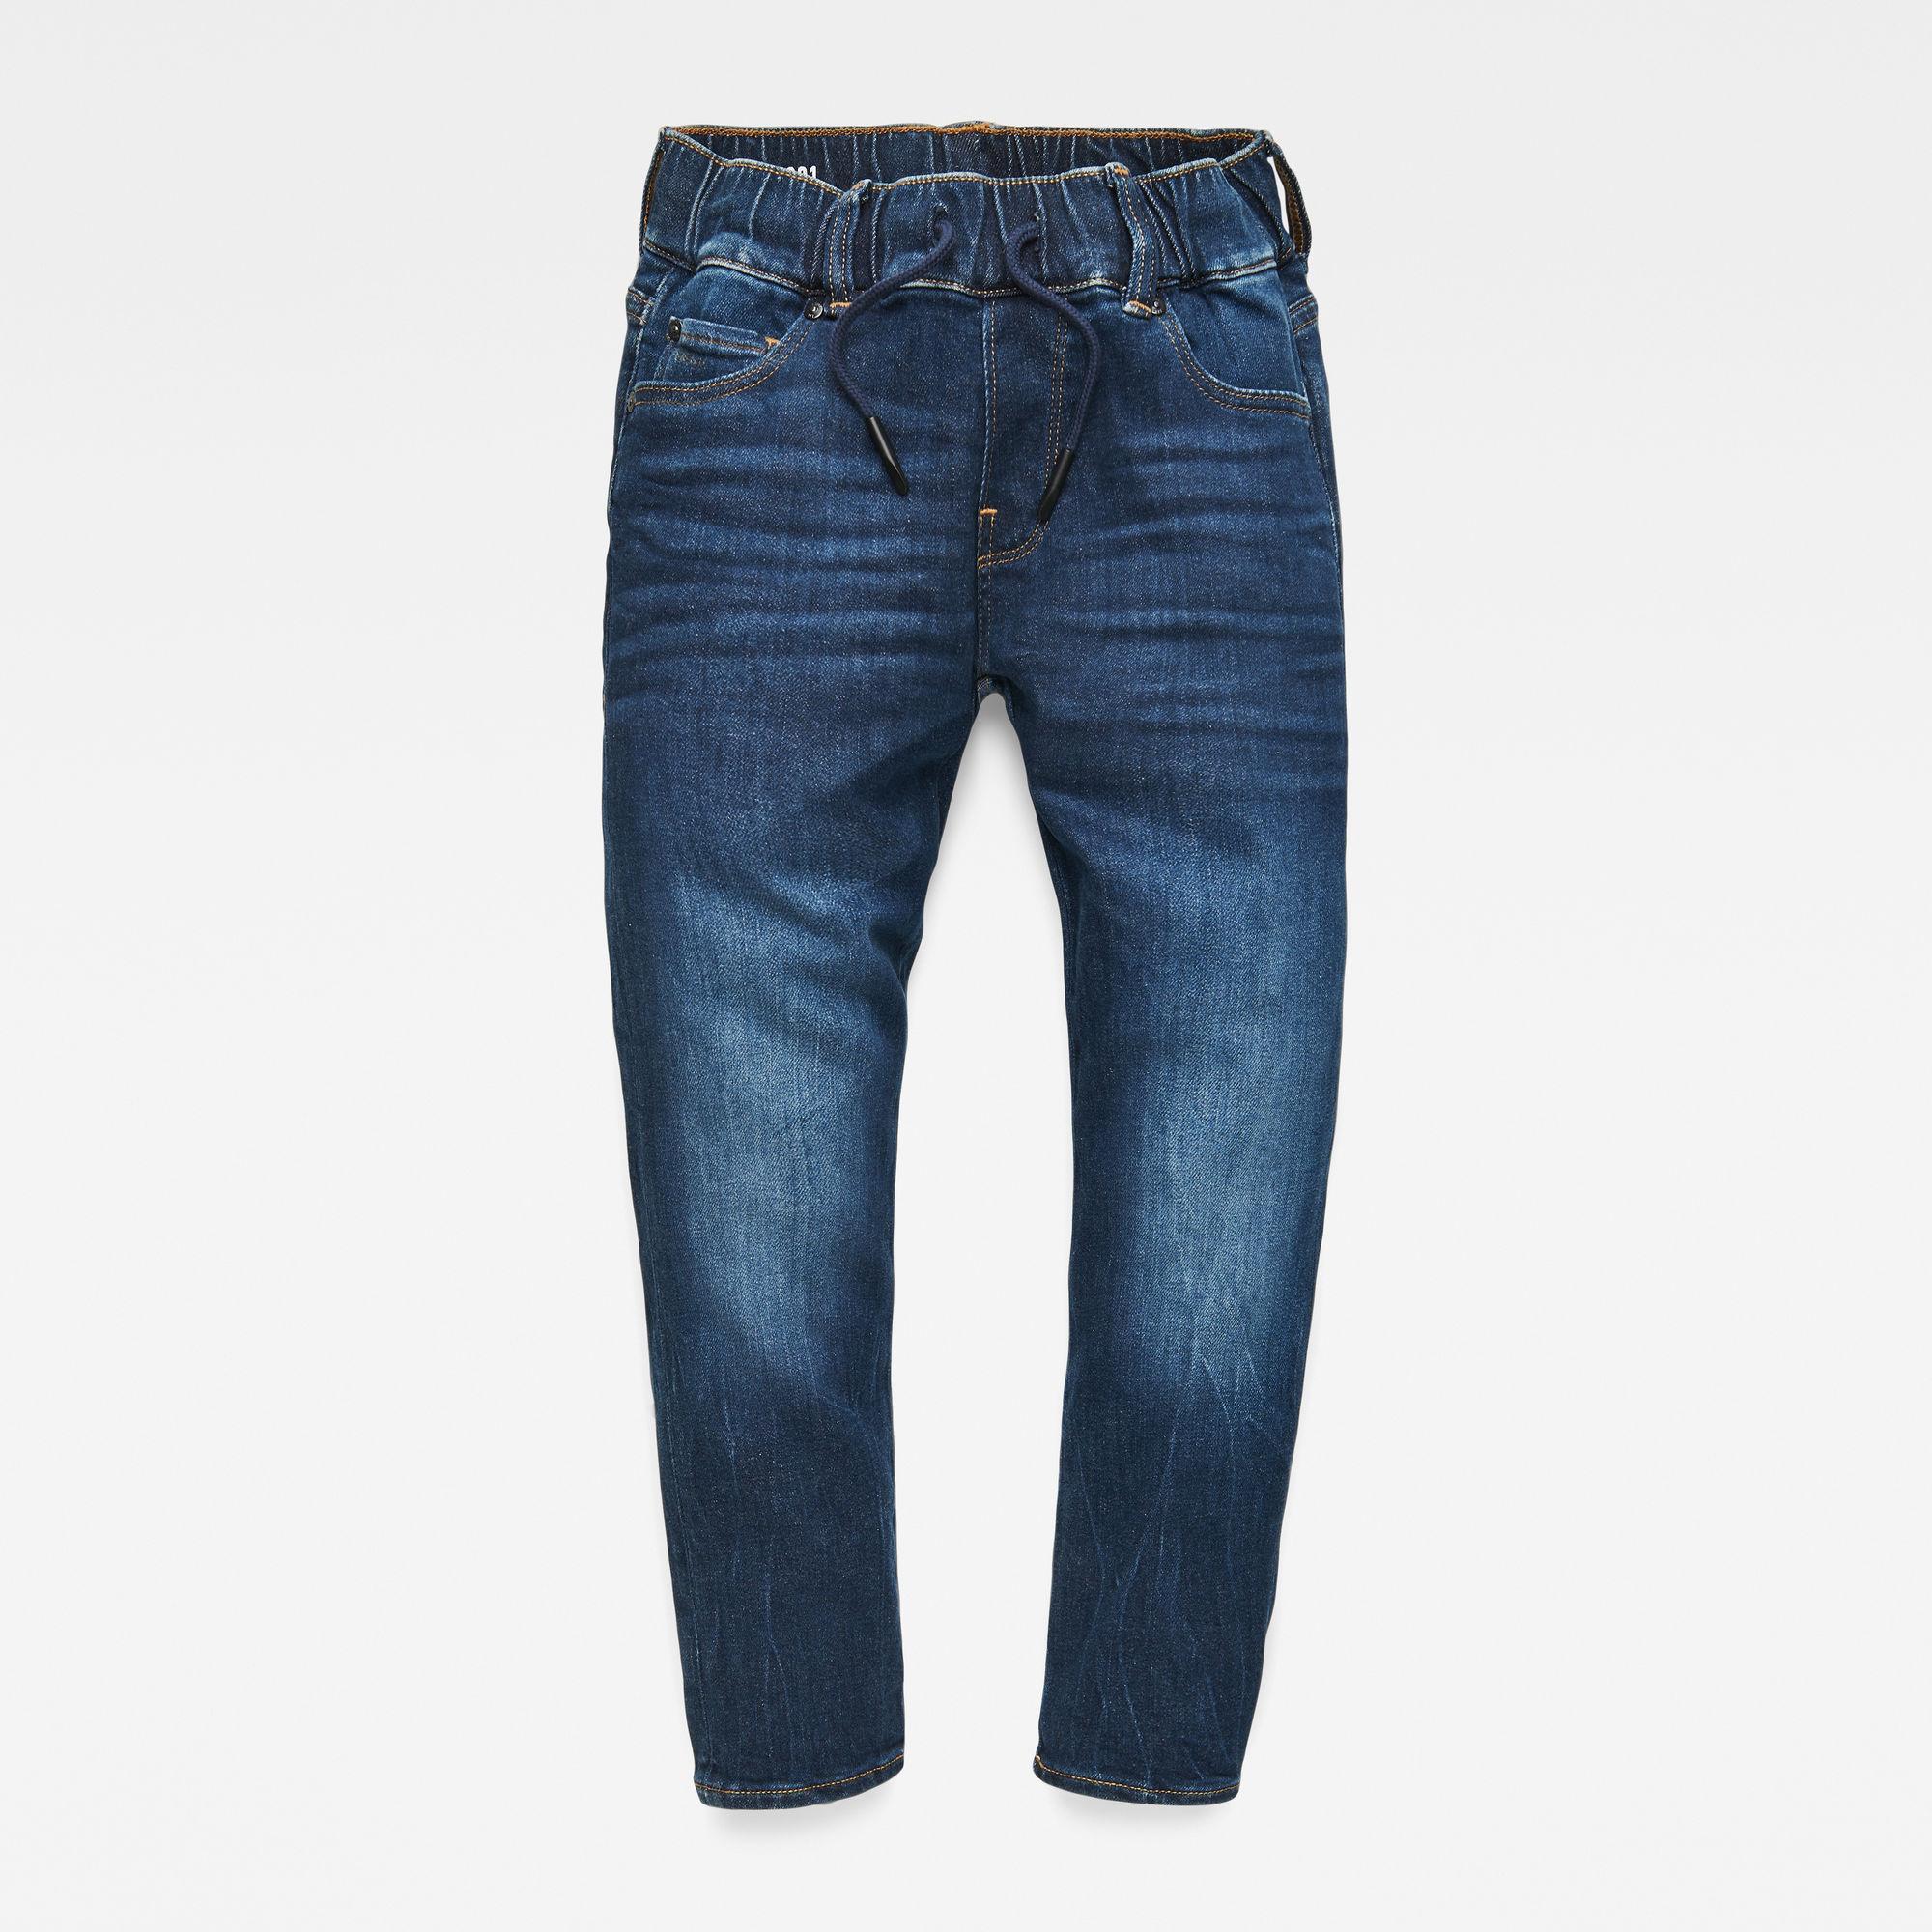 G-Star RAW Jongens 3301 Slim pull-up jeans Blauw